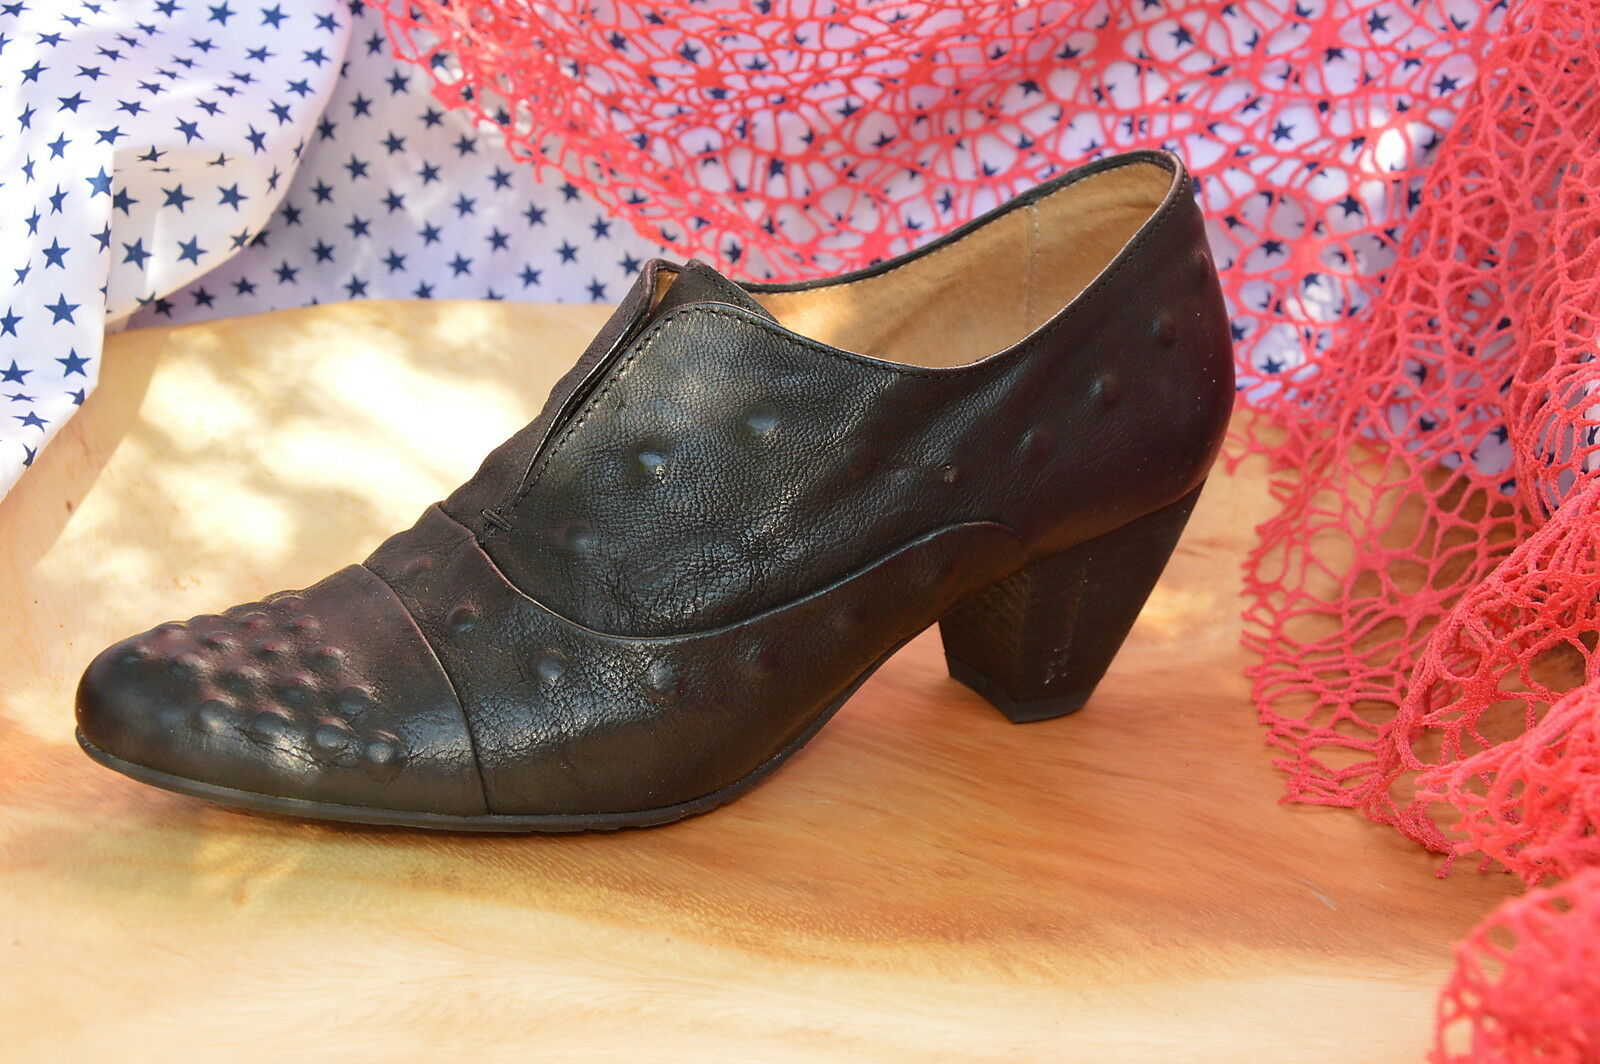 %% Maciejka traumhafte echt Leder Schuhe 37 NEU %%